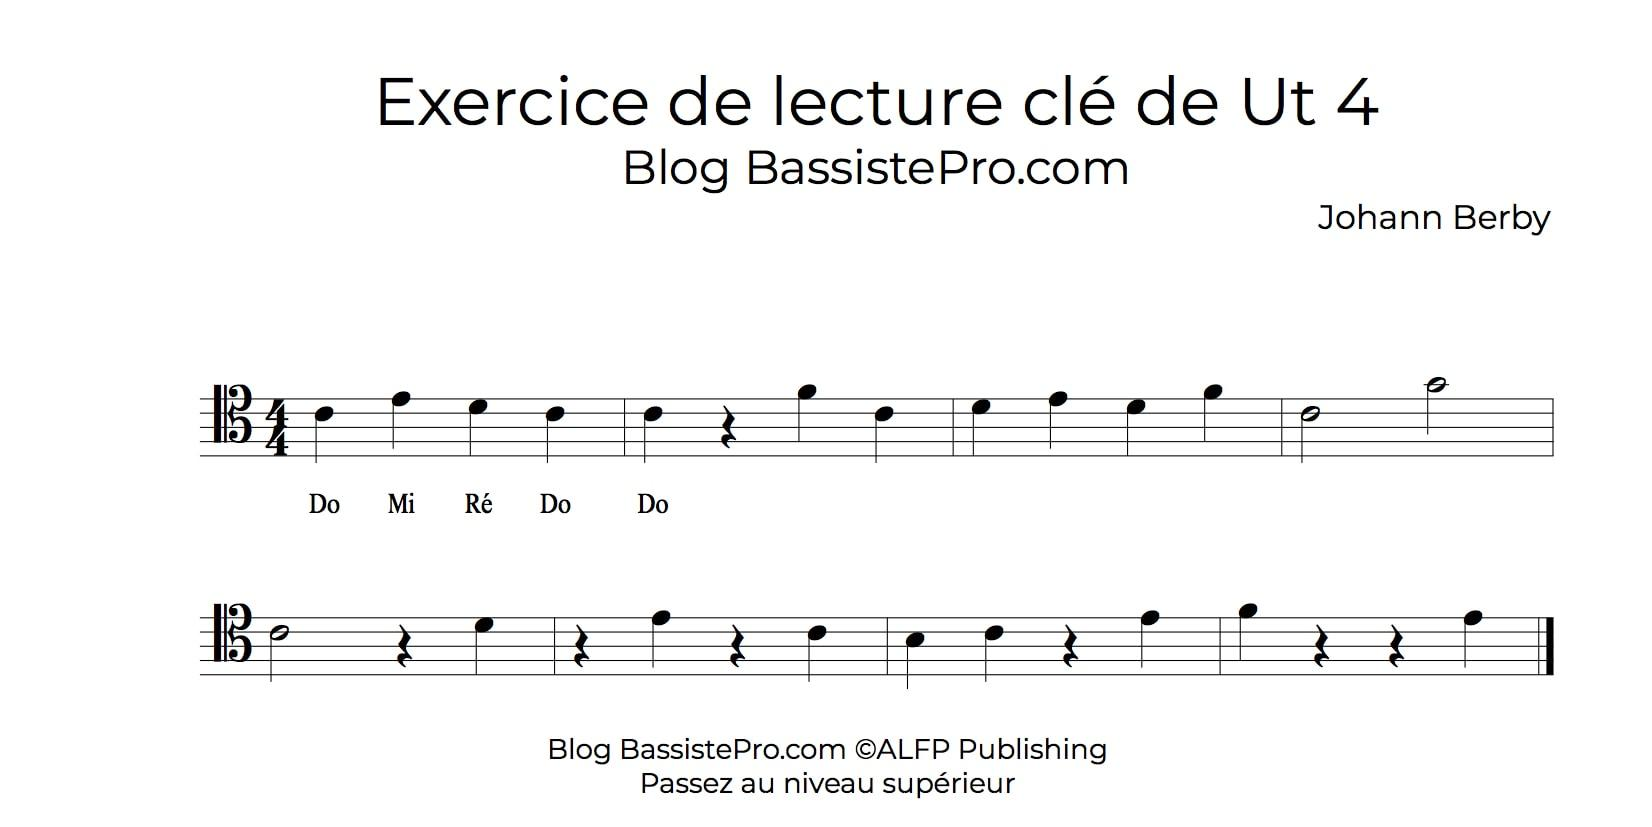 manuel pratique dandelot cle ut4